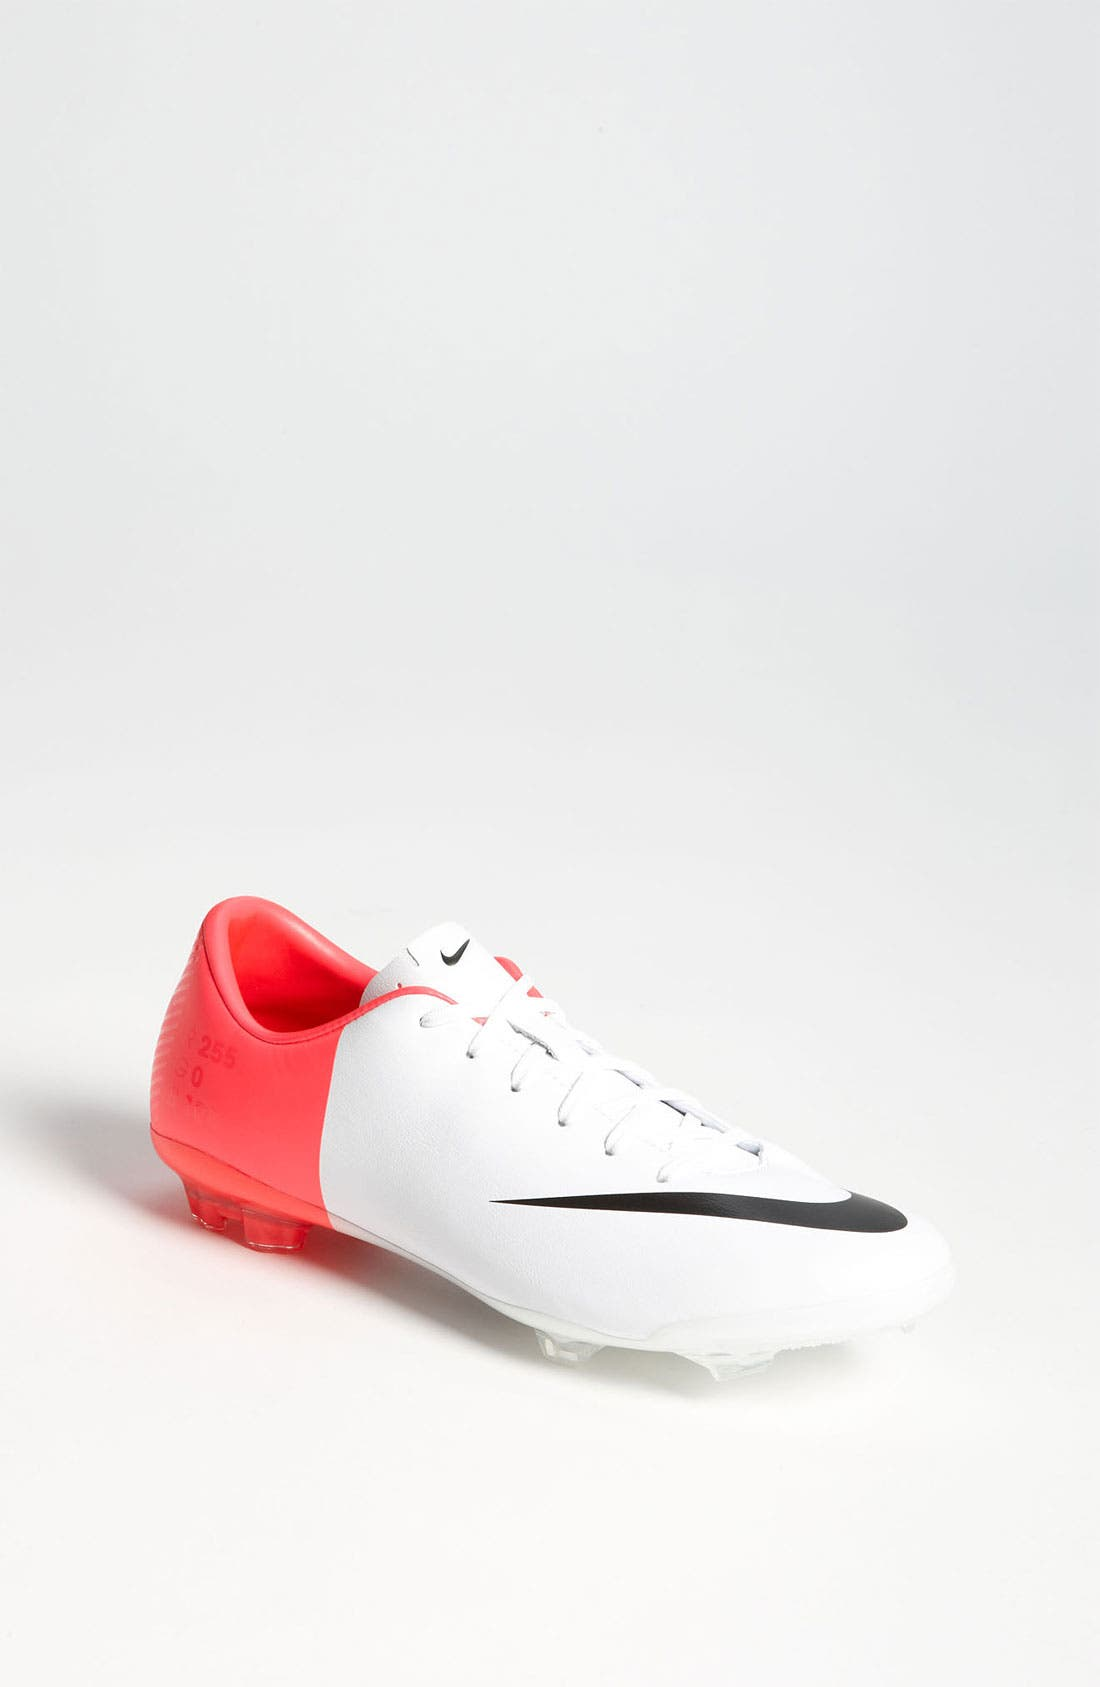 Main Image - Nike 'Mercurial Vapor VIII' Soccer Shoe (Little Kid & Big Kid)